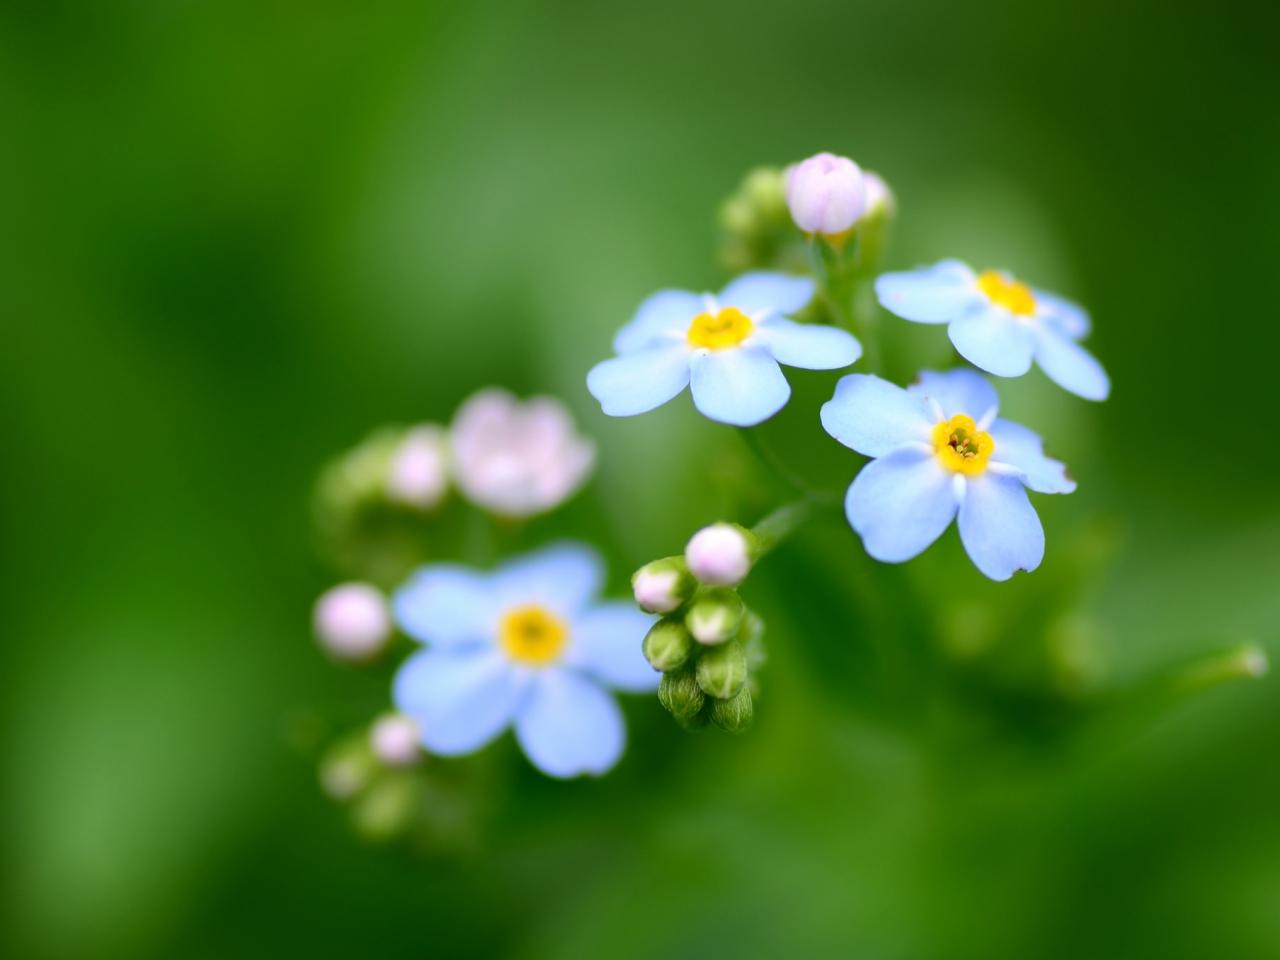 Flores azules - 1280x960